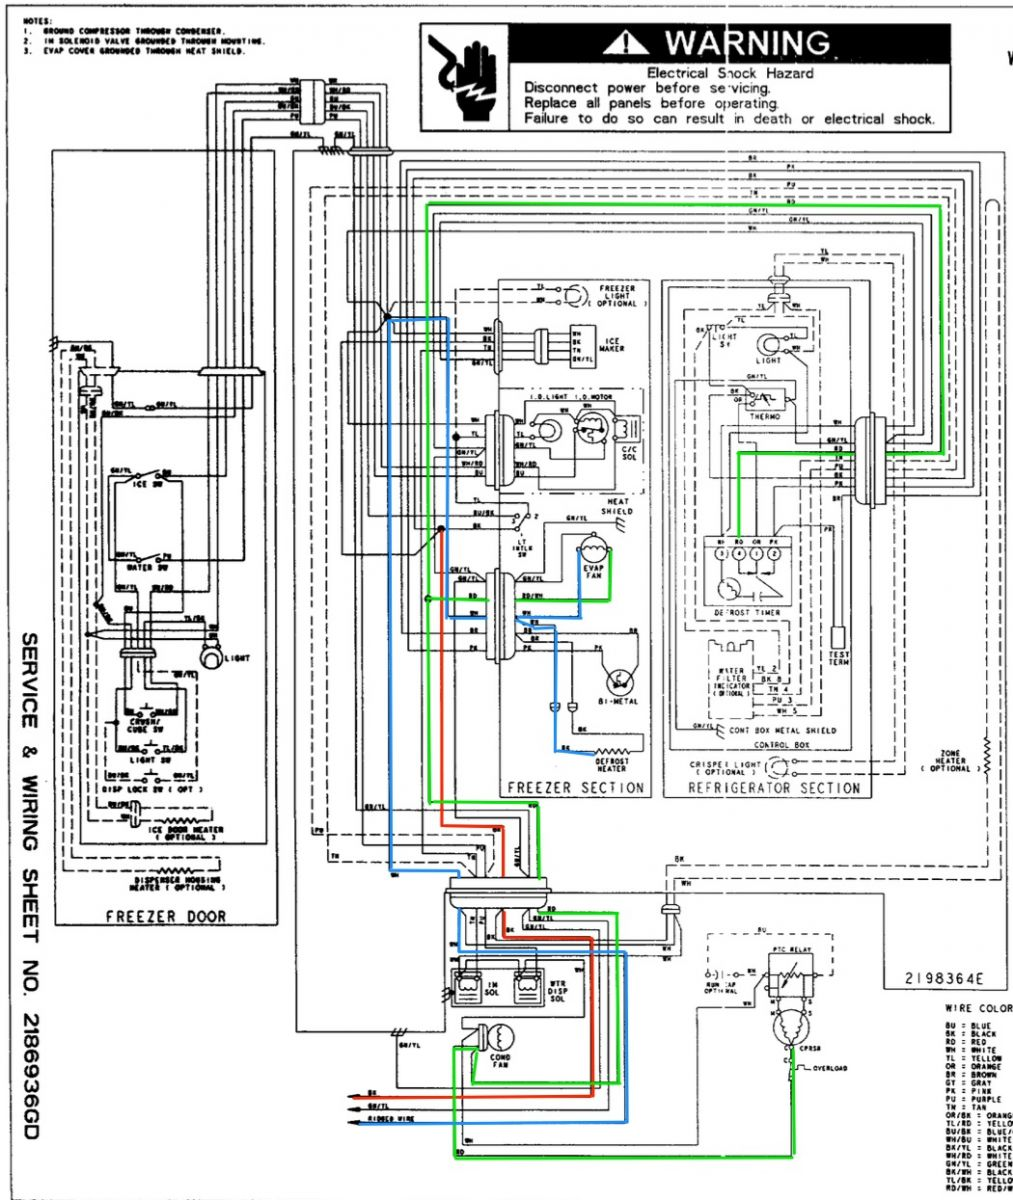 Whirlpool ED25RFXFW01 Refrigerator Wiring Diagram The